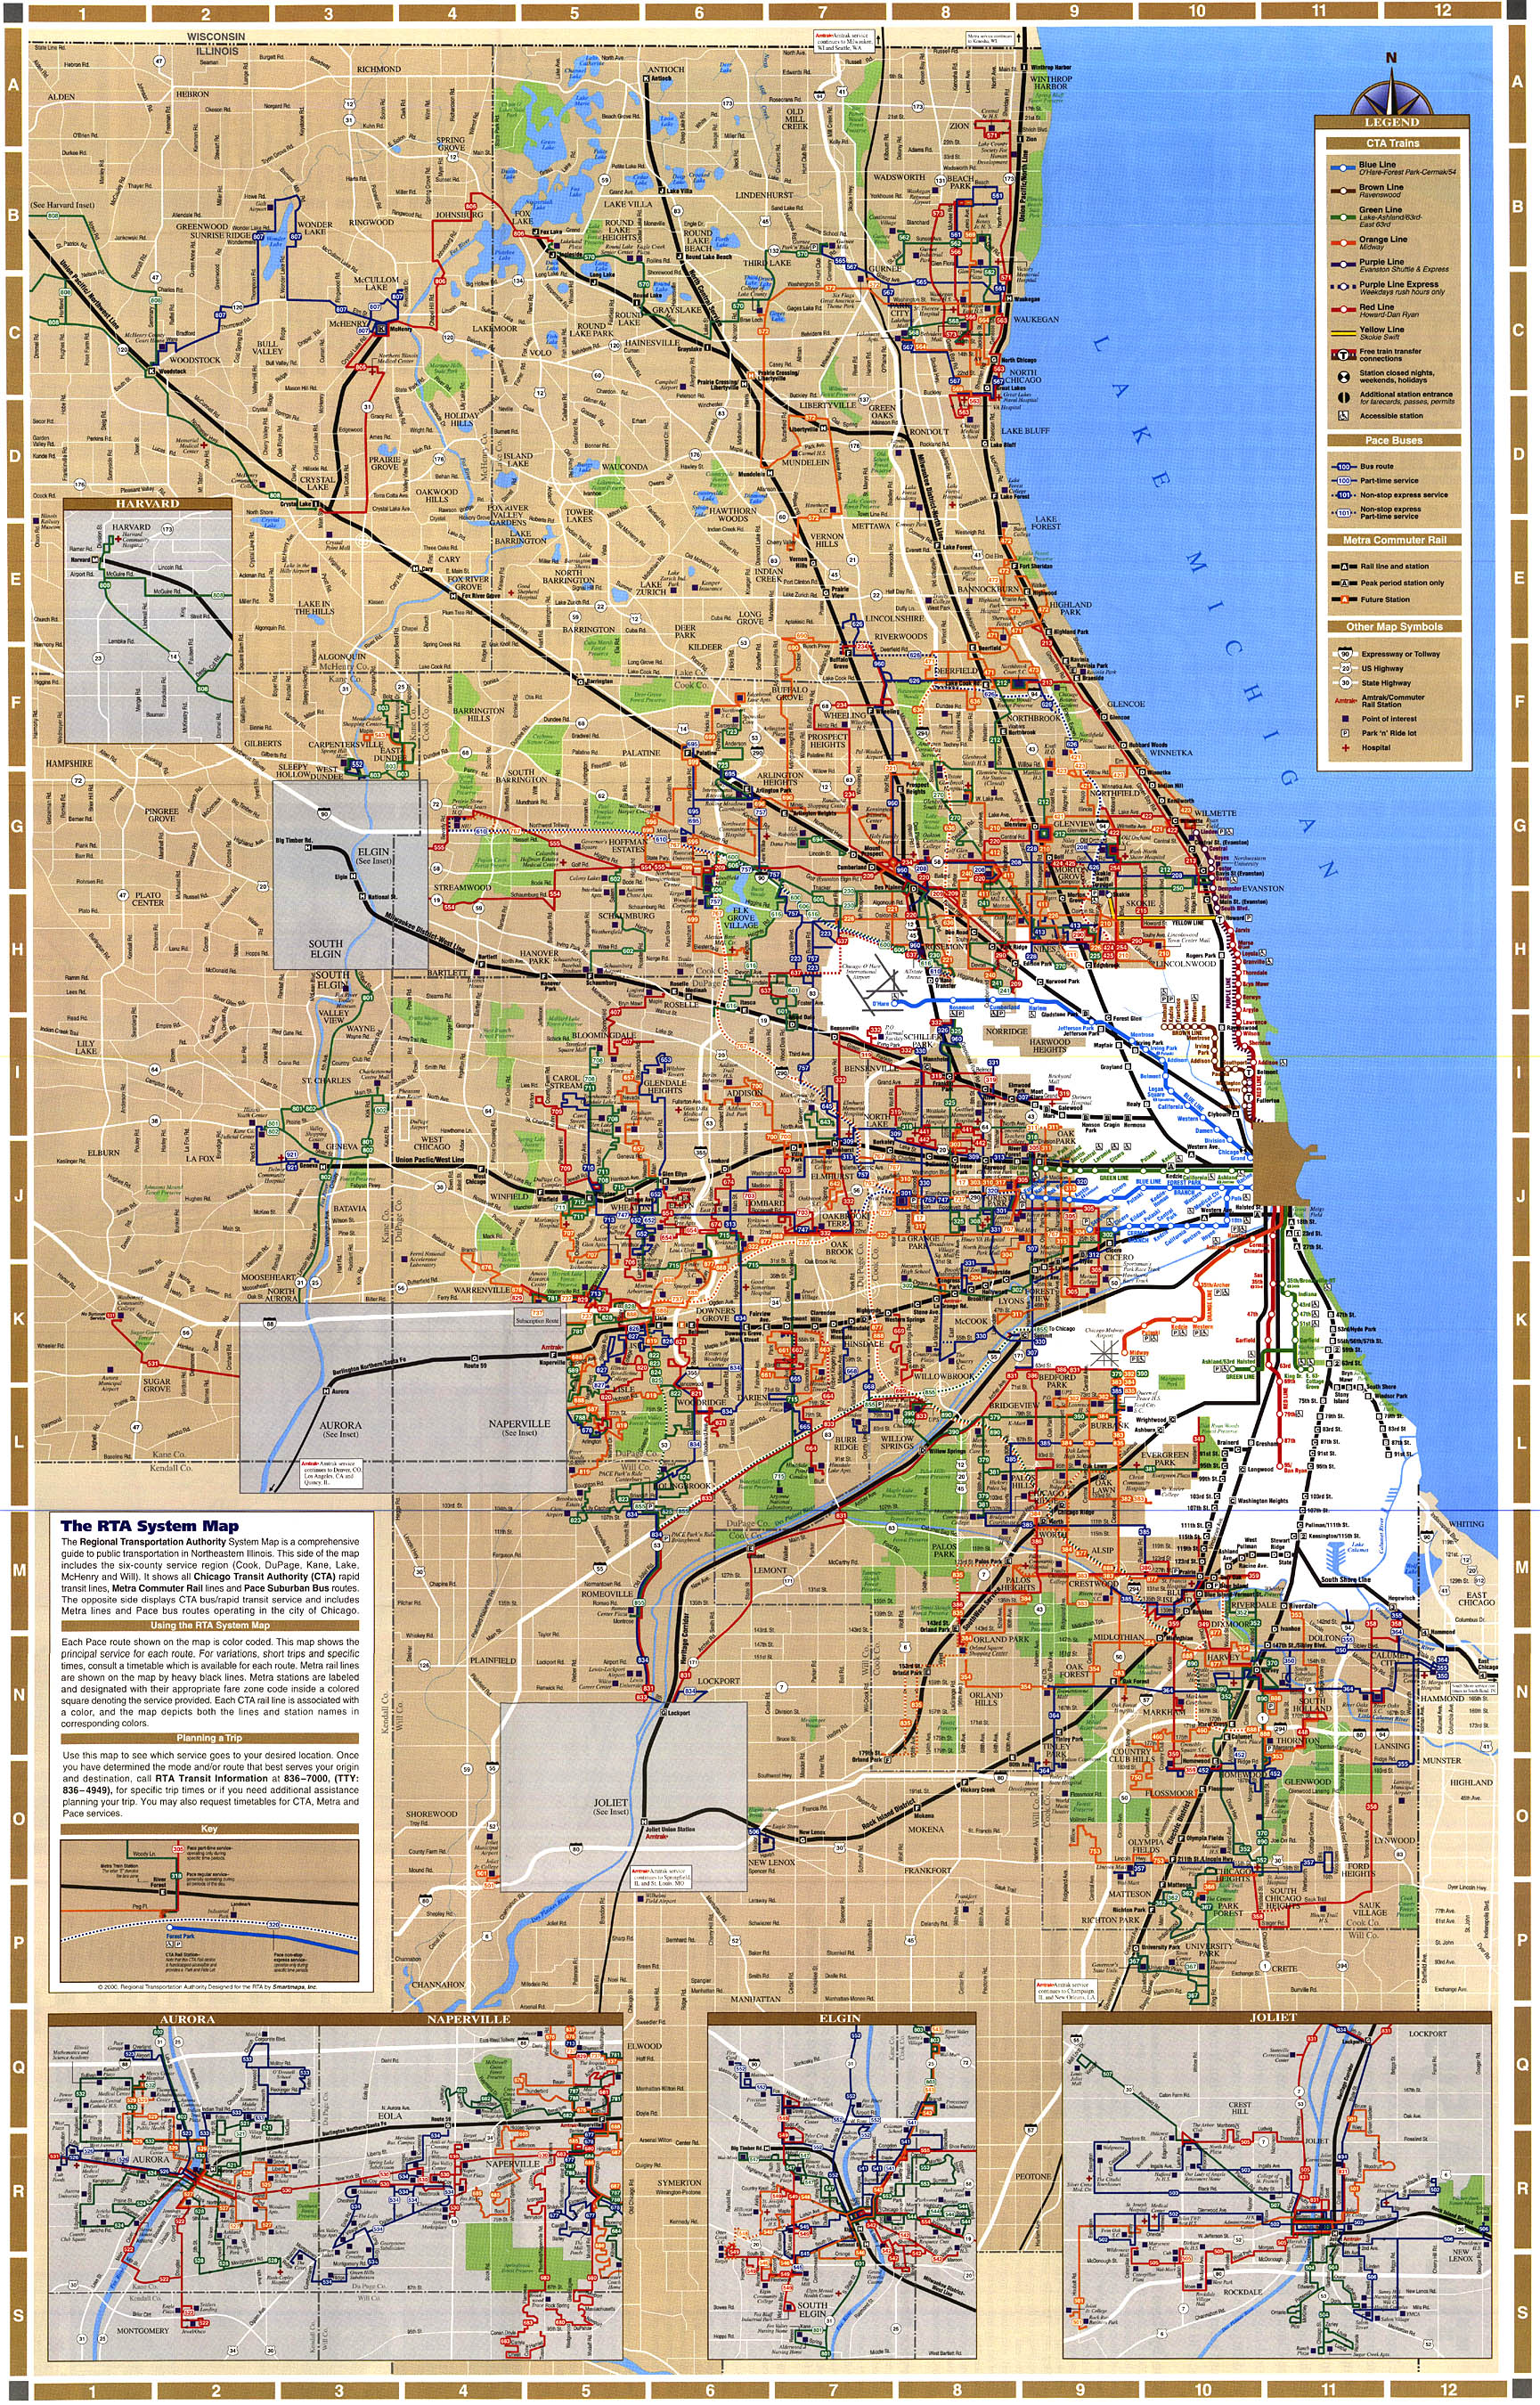 Nyc subway 6 line map zone